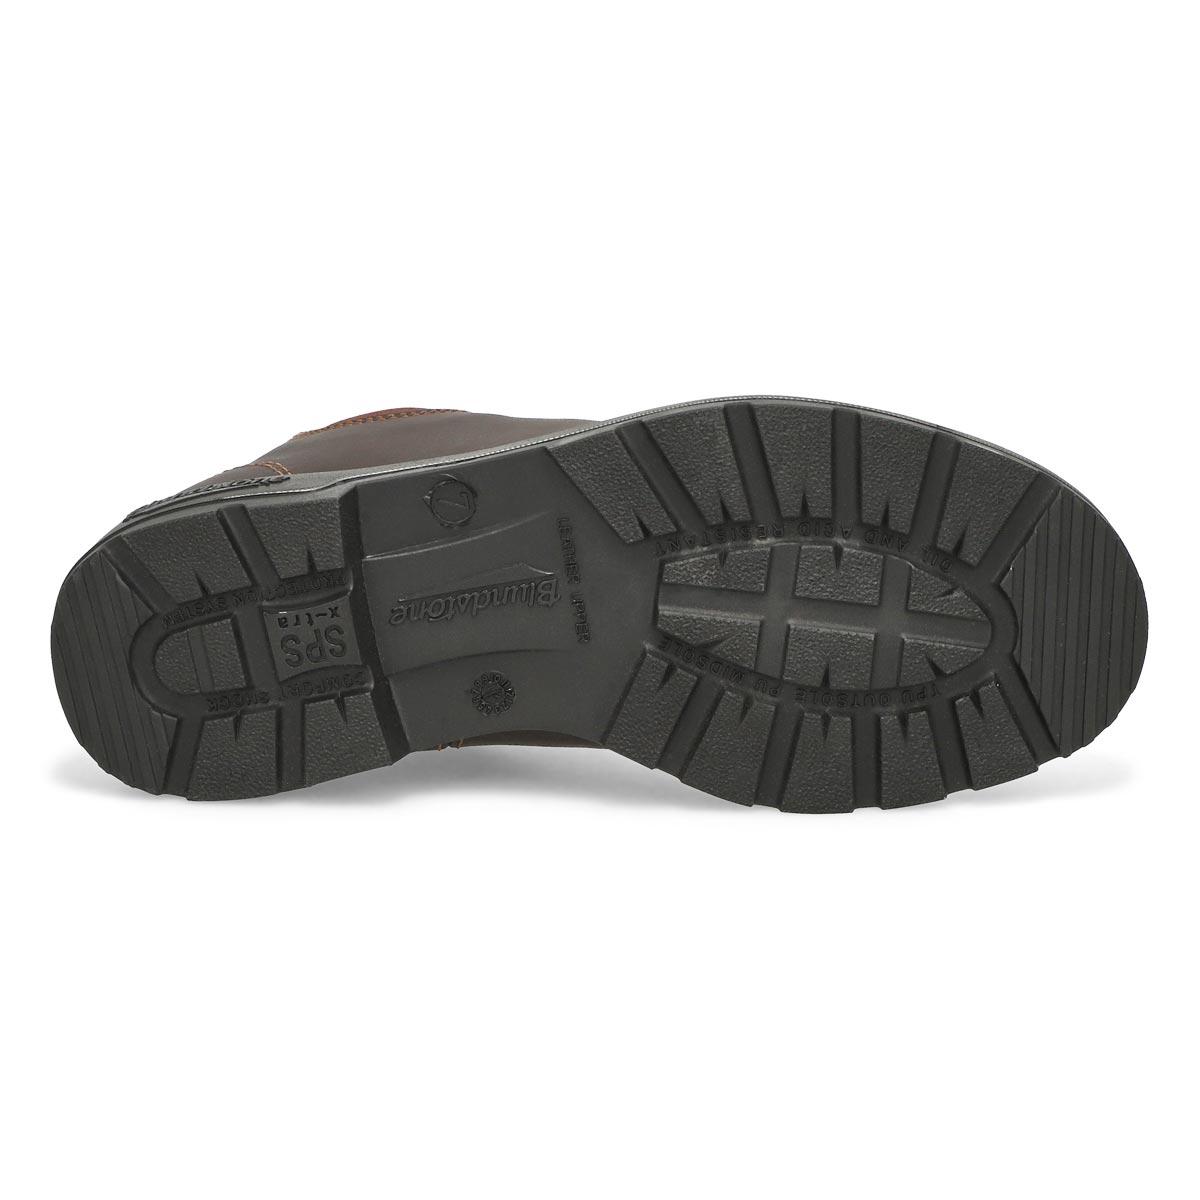 Unisex 550 Original Boot - Walnut